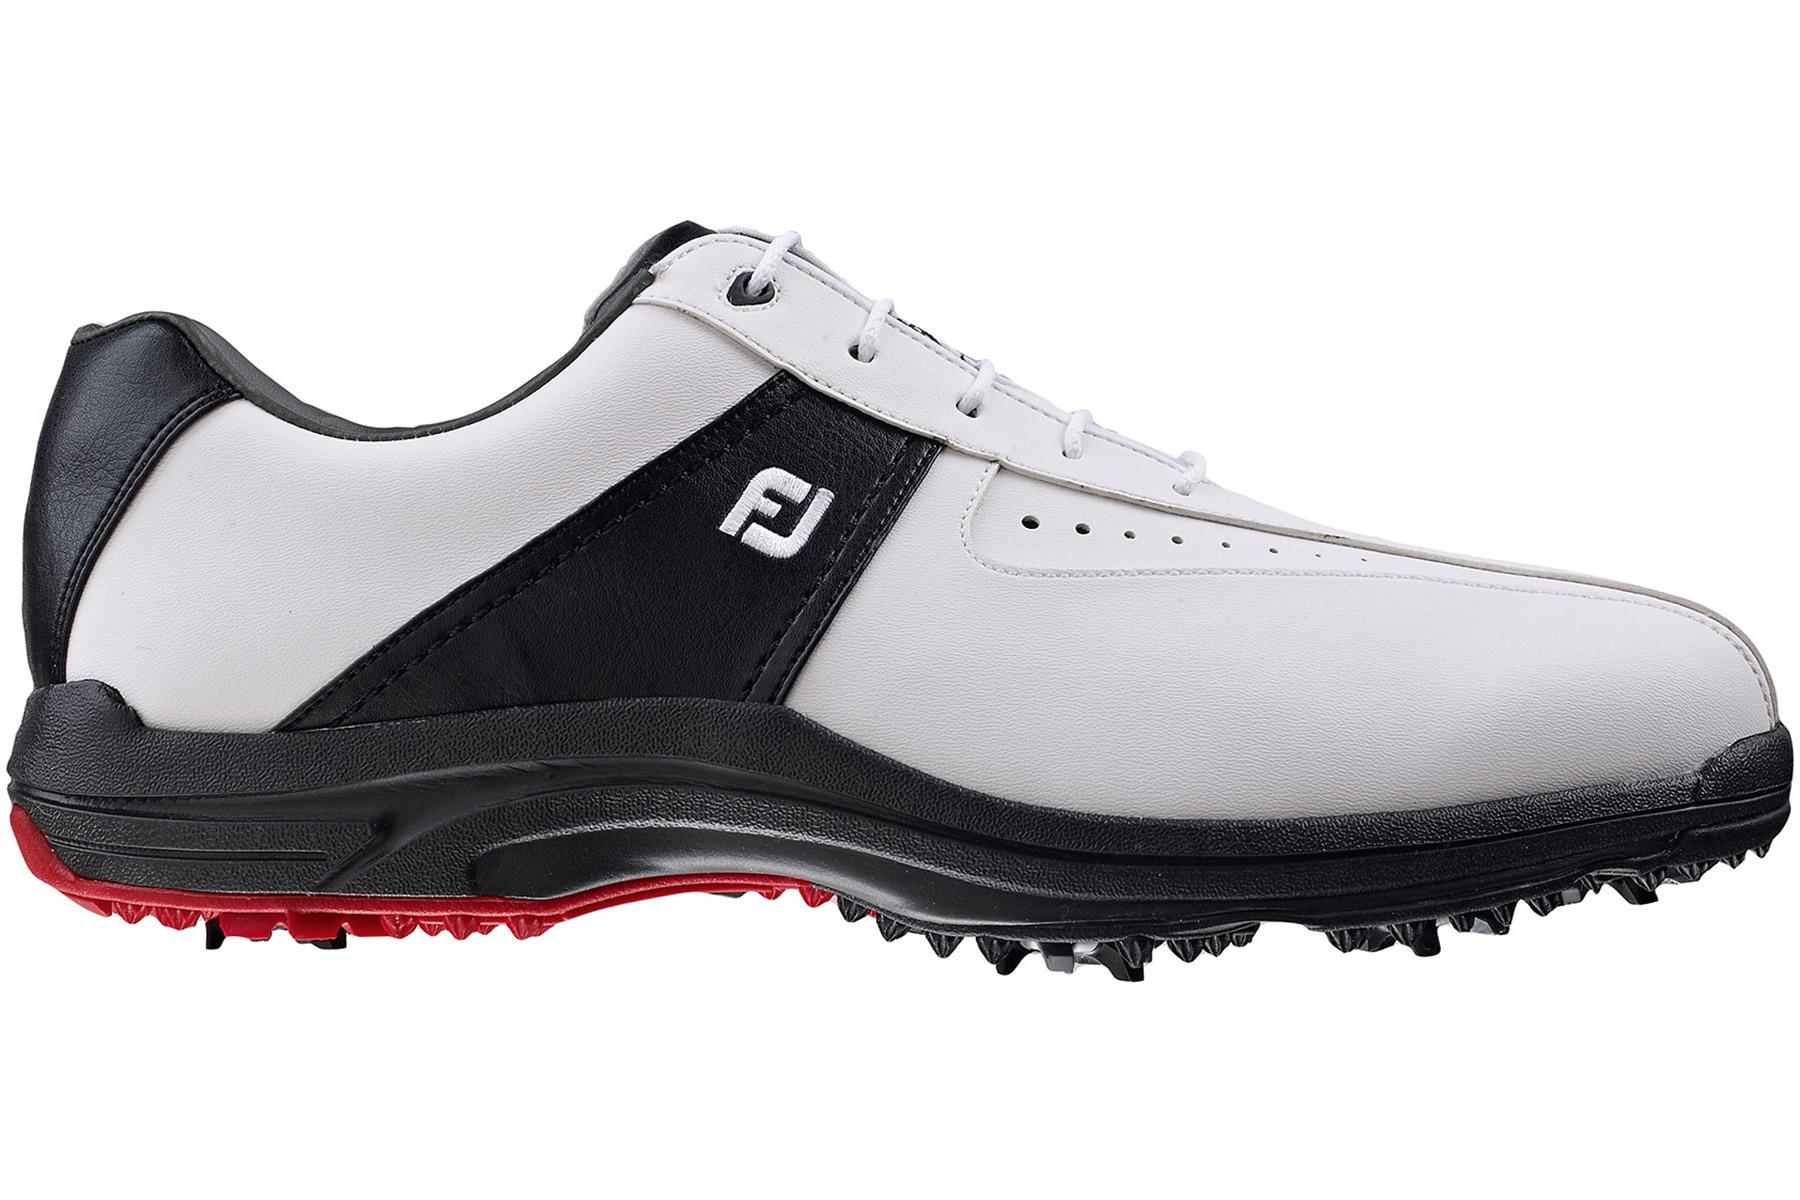 Footjoy Shoes Online